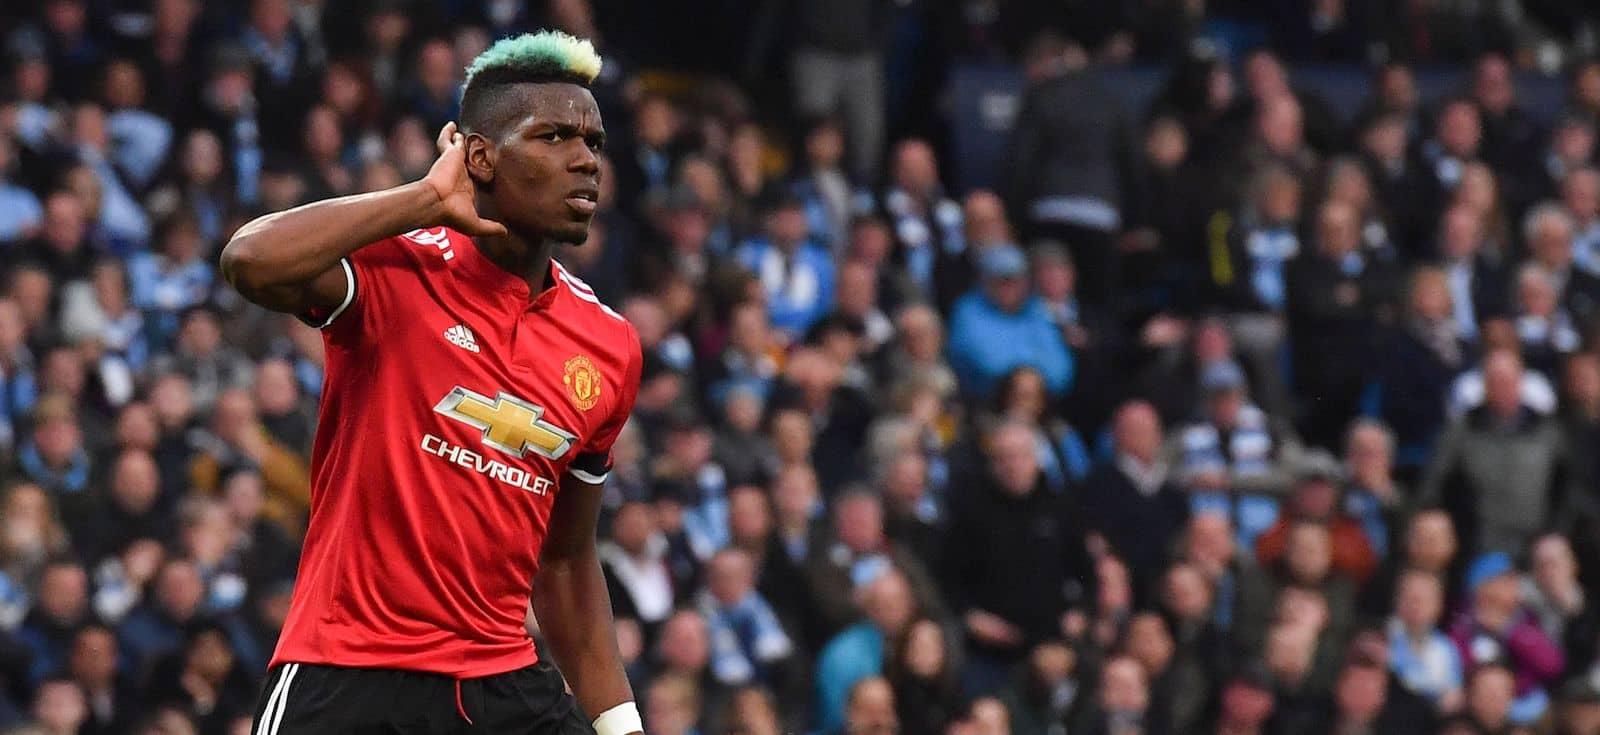 Gary Neville: Paul Pogba's agent Mino Raiola is a bit of a joke